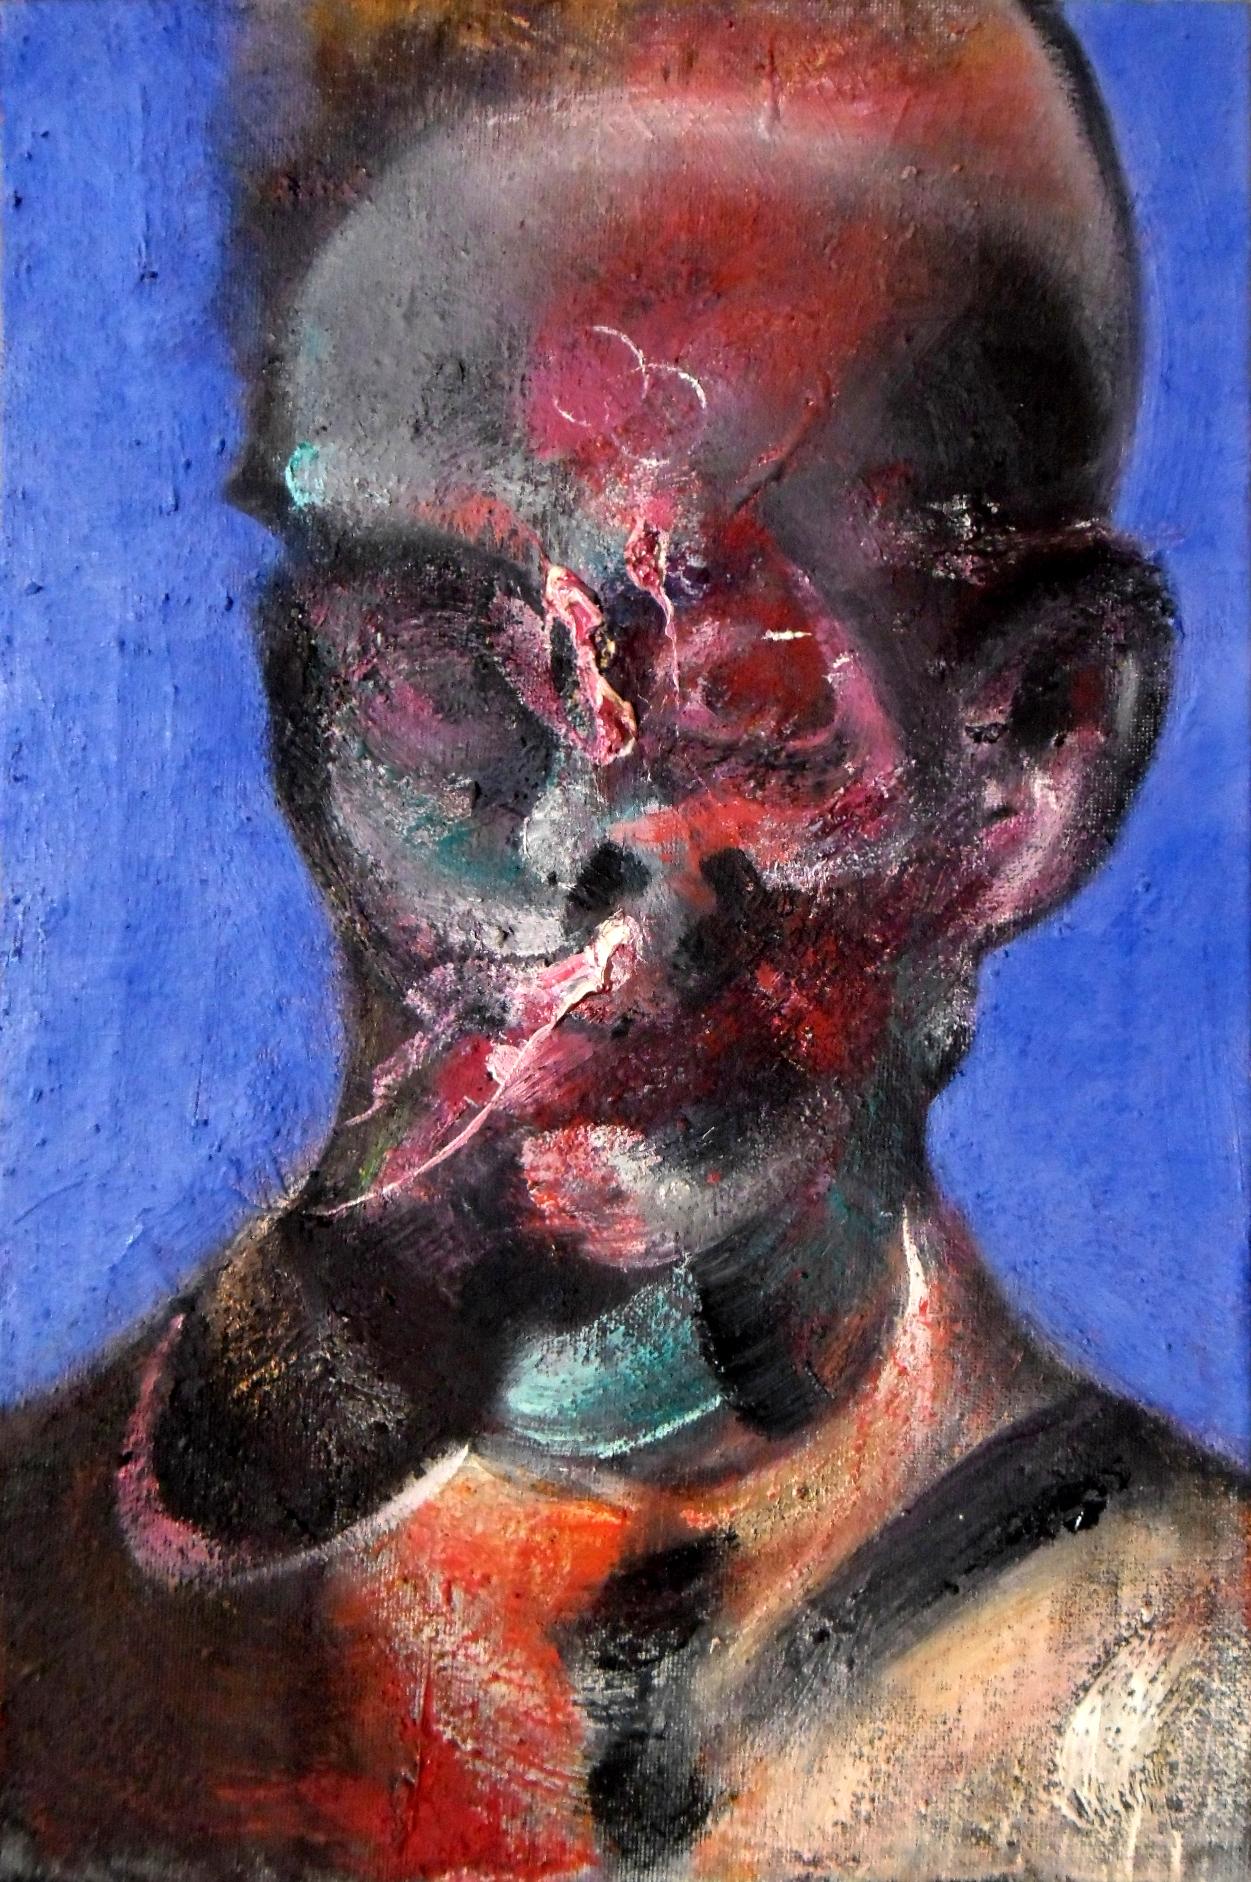 Study for Portrait of E.Schiele on Blue, 2013 by RyckRudd